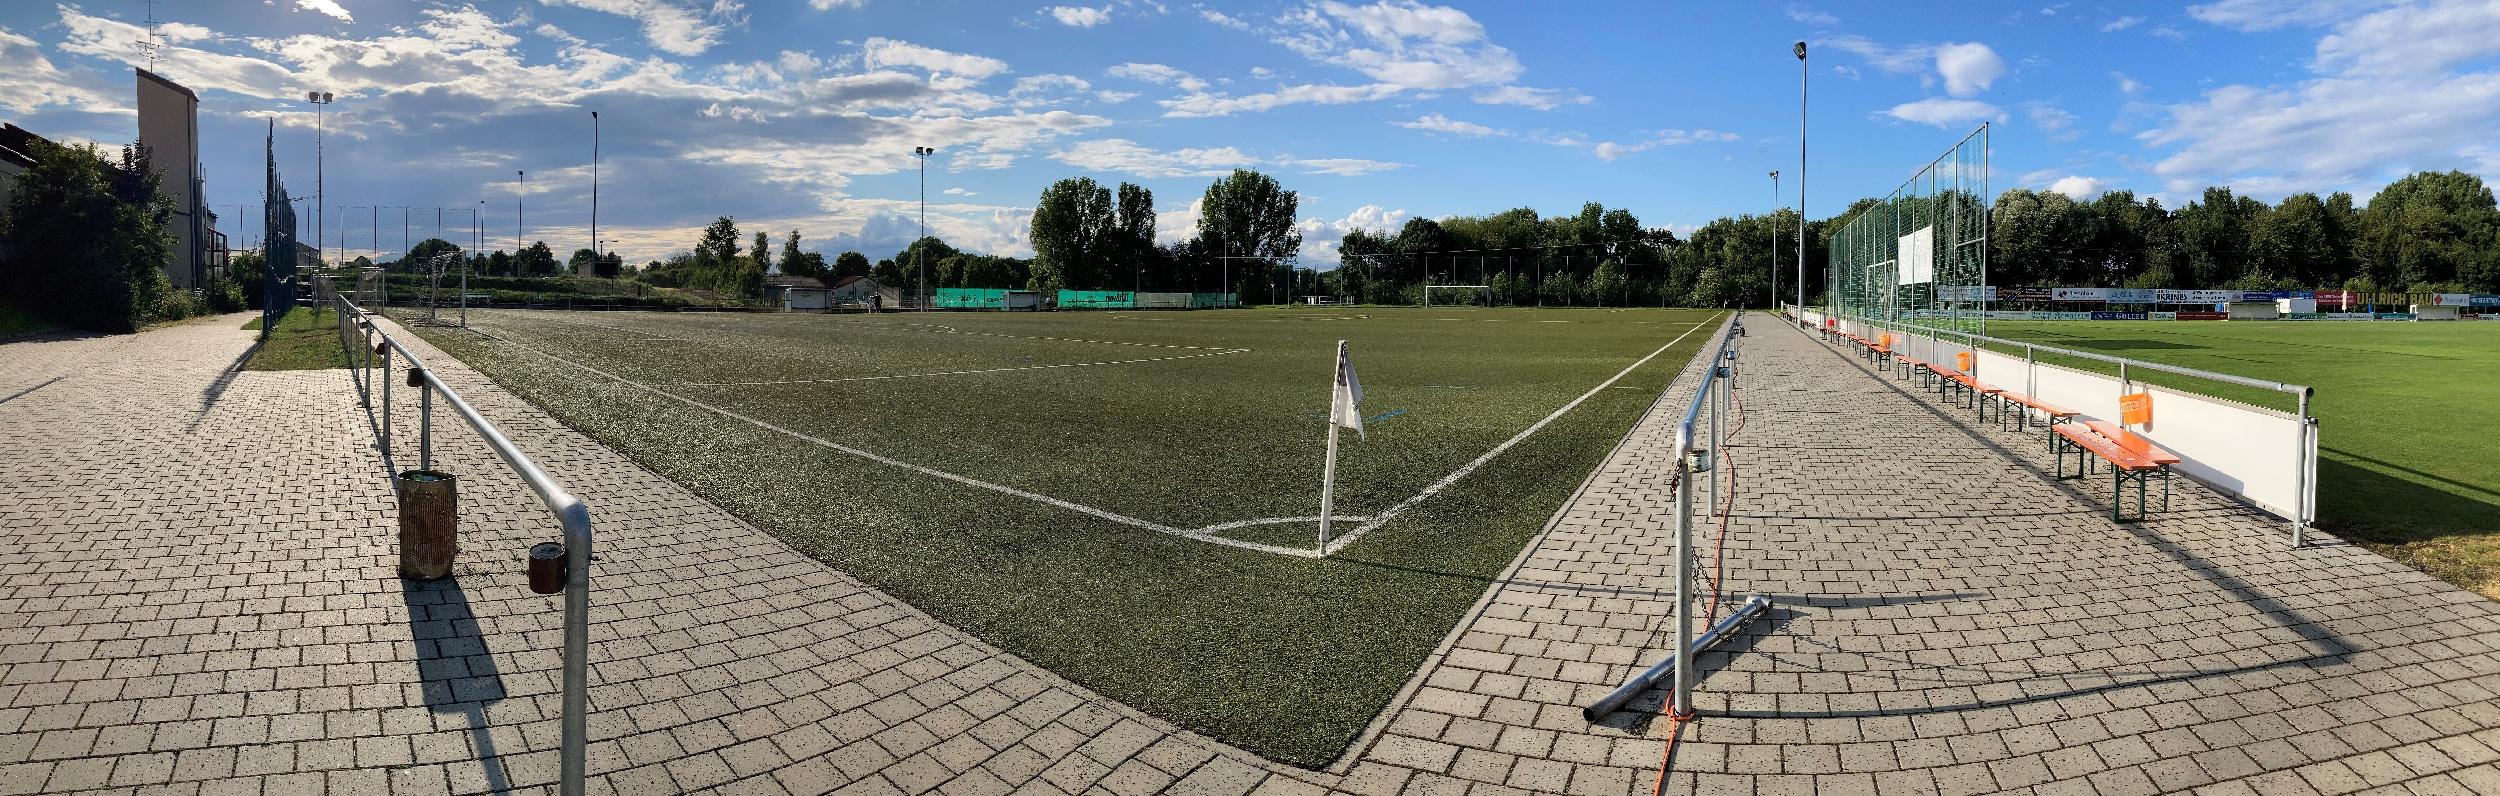 FC Sand korbmacher11 verein sportgelaende 1627929199